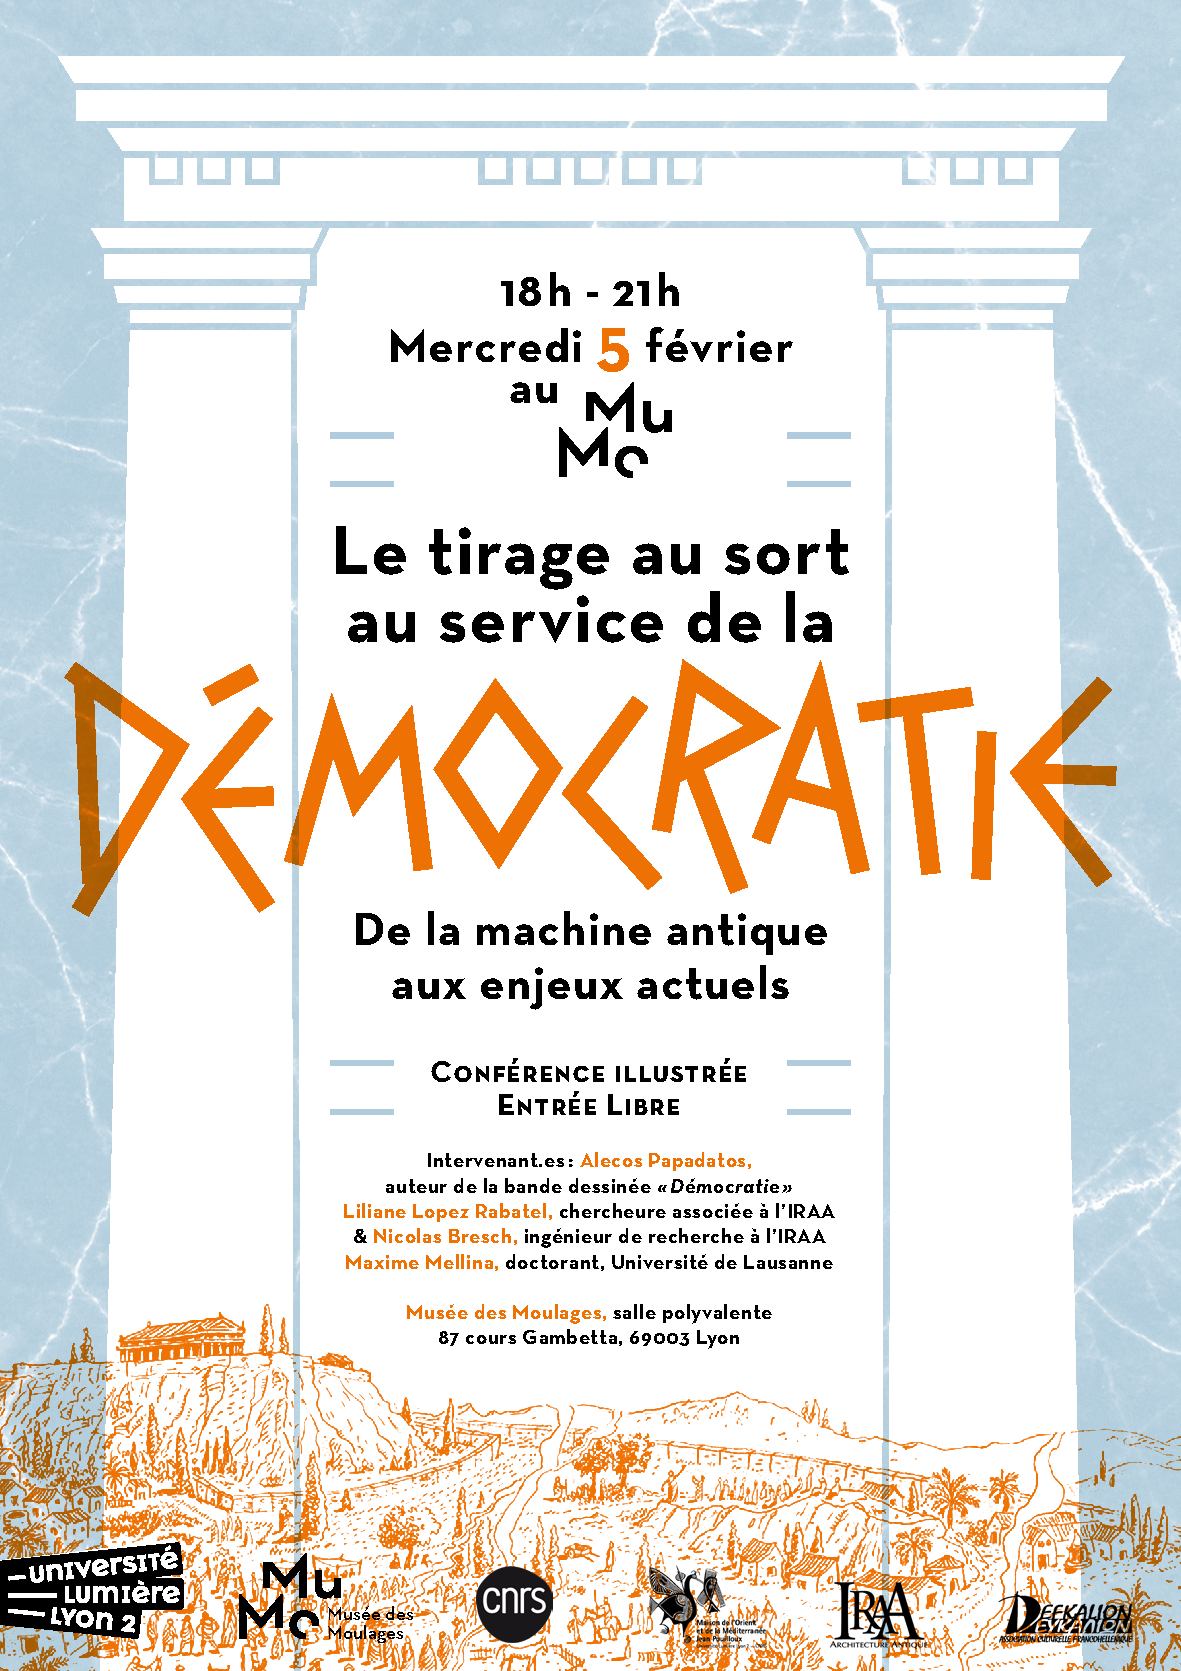 AFF democratie